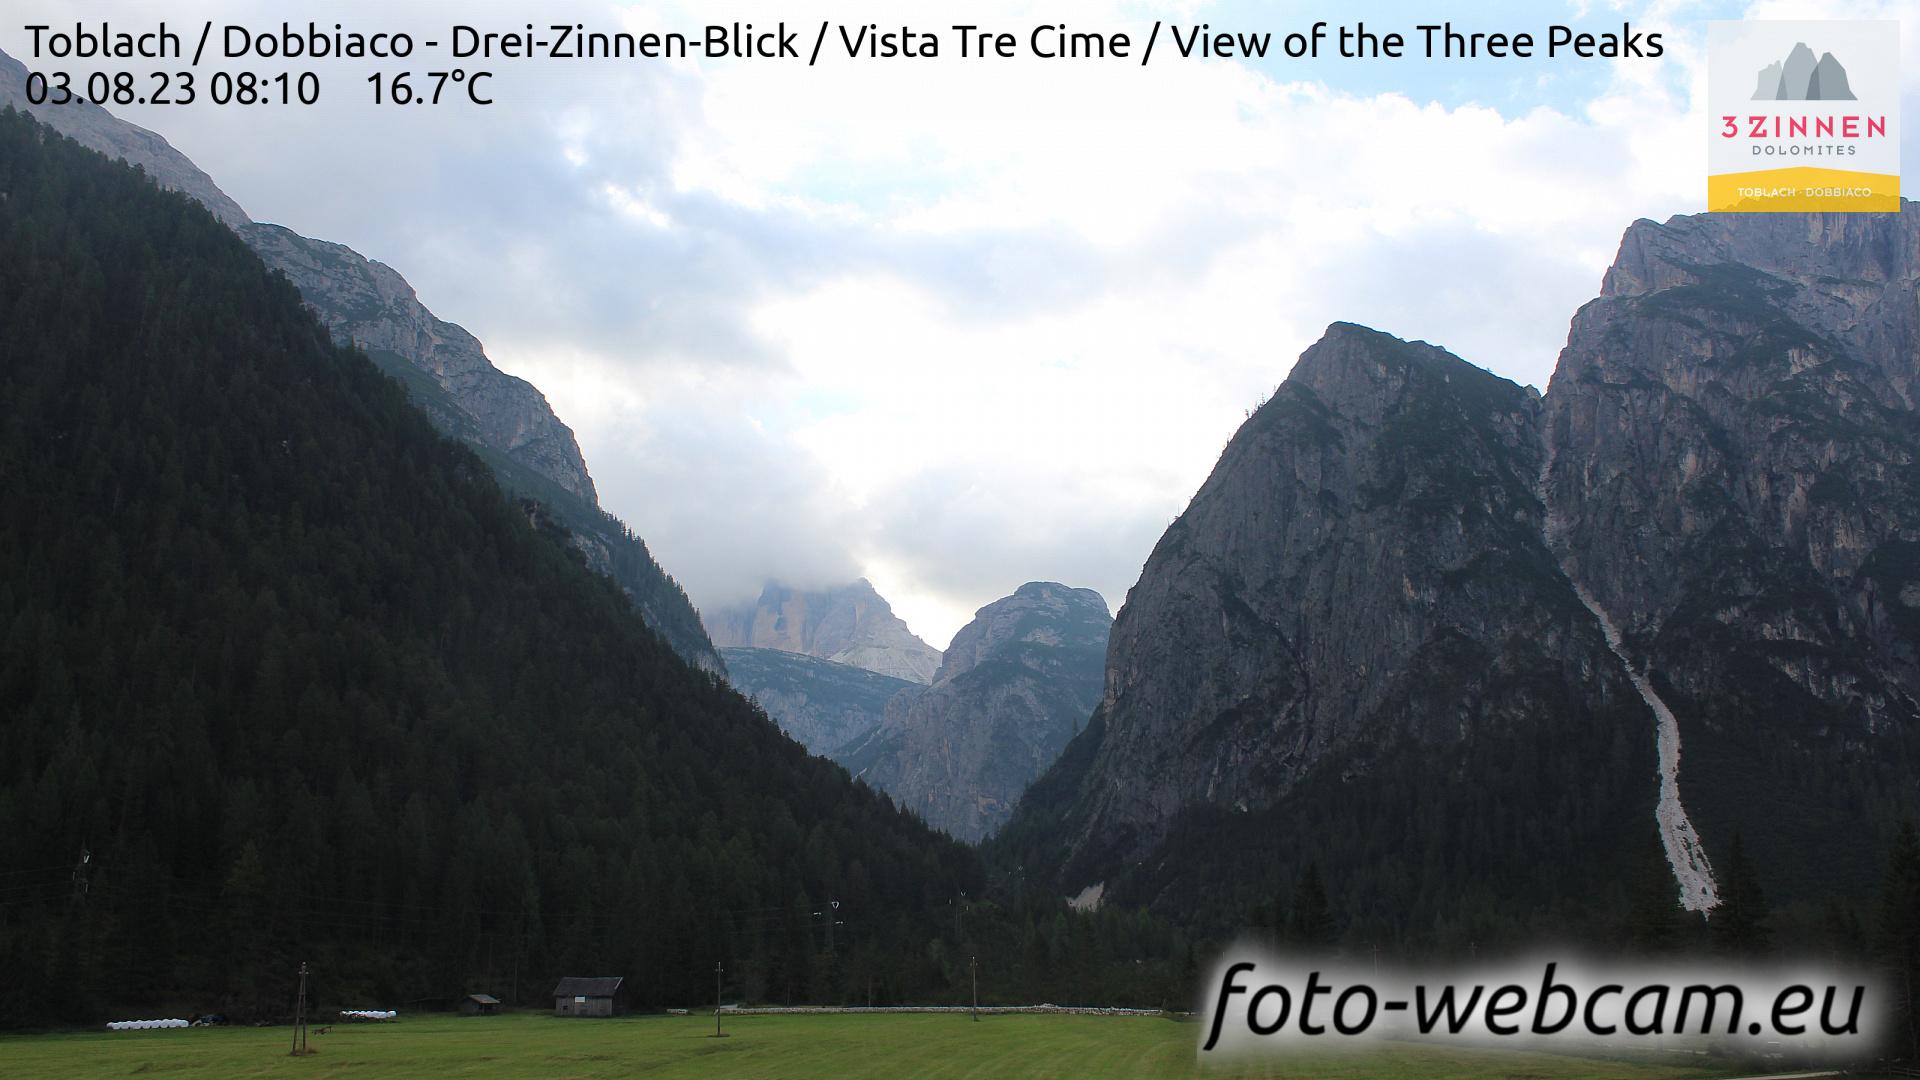 Toblach (Dolomites) Tue. 08:27